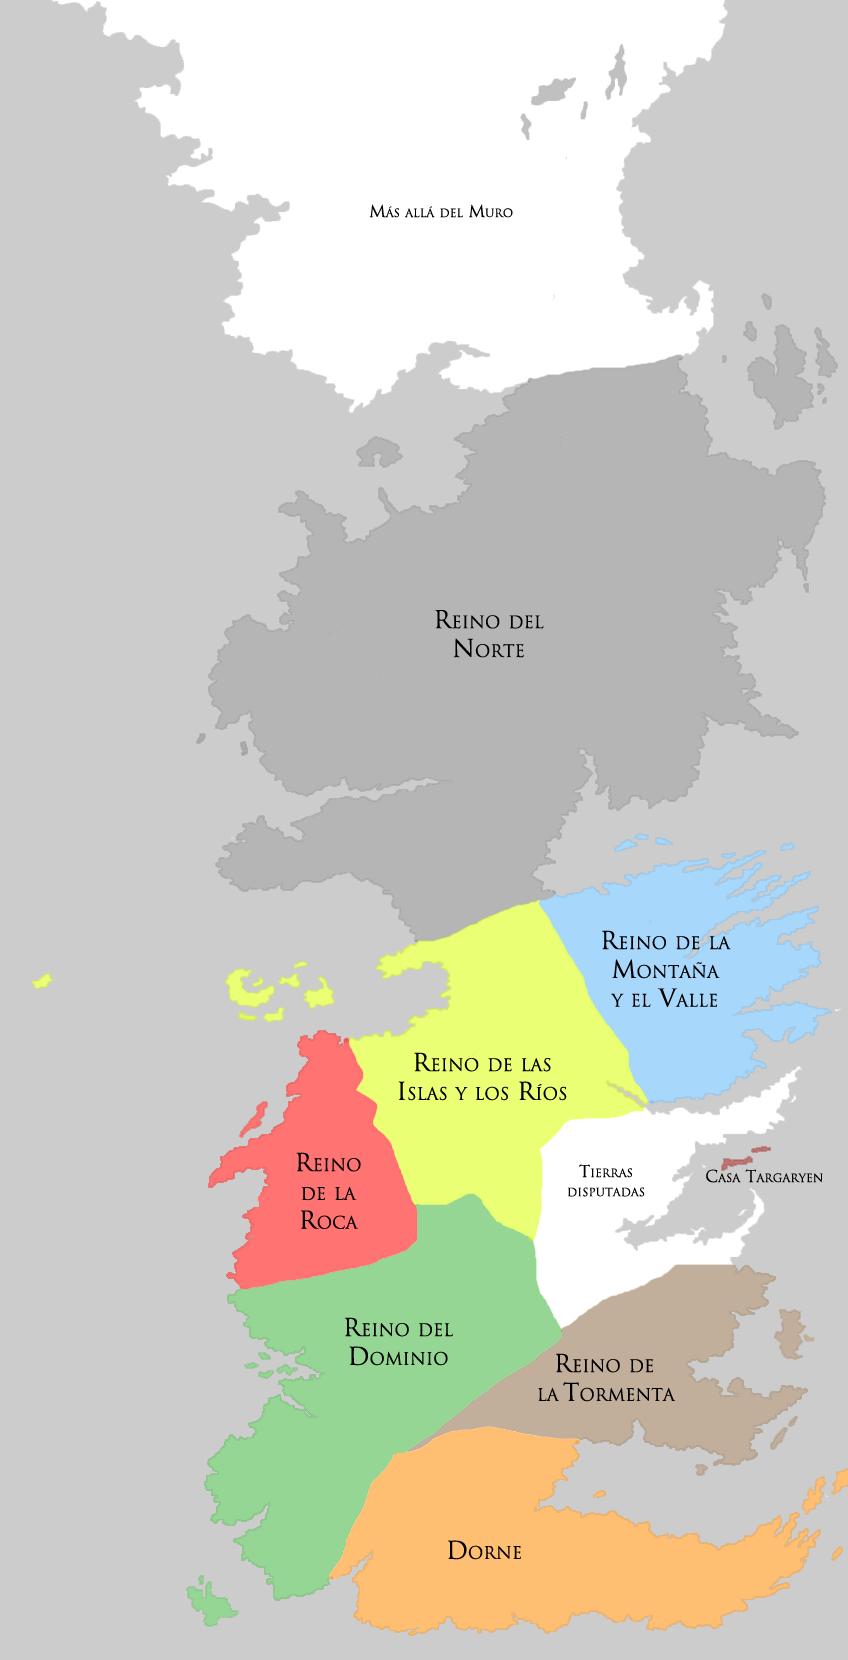 Siete Reinos Hielo Y Fuego Wiki Fandom Powered By Wikia